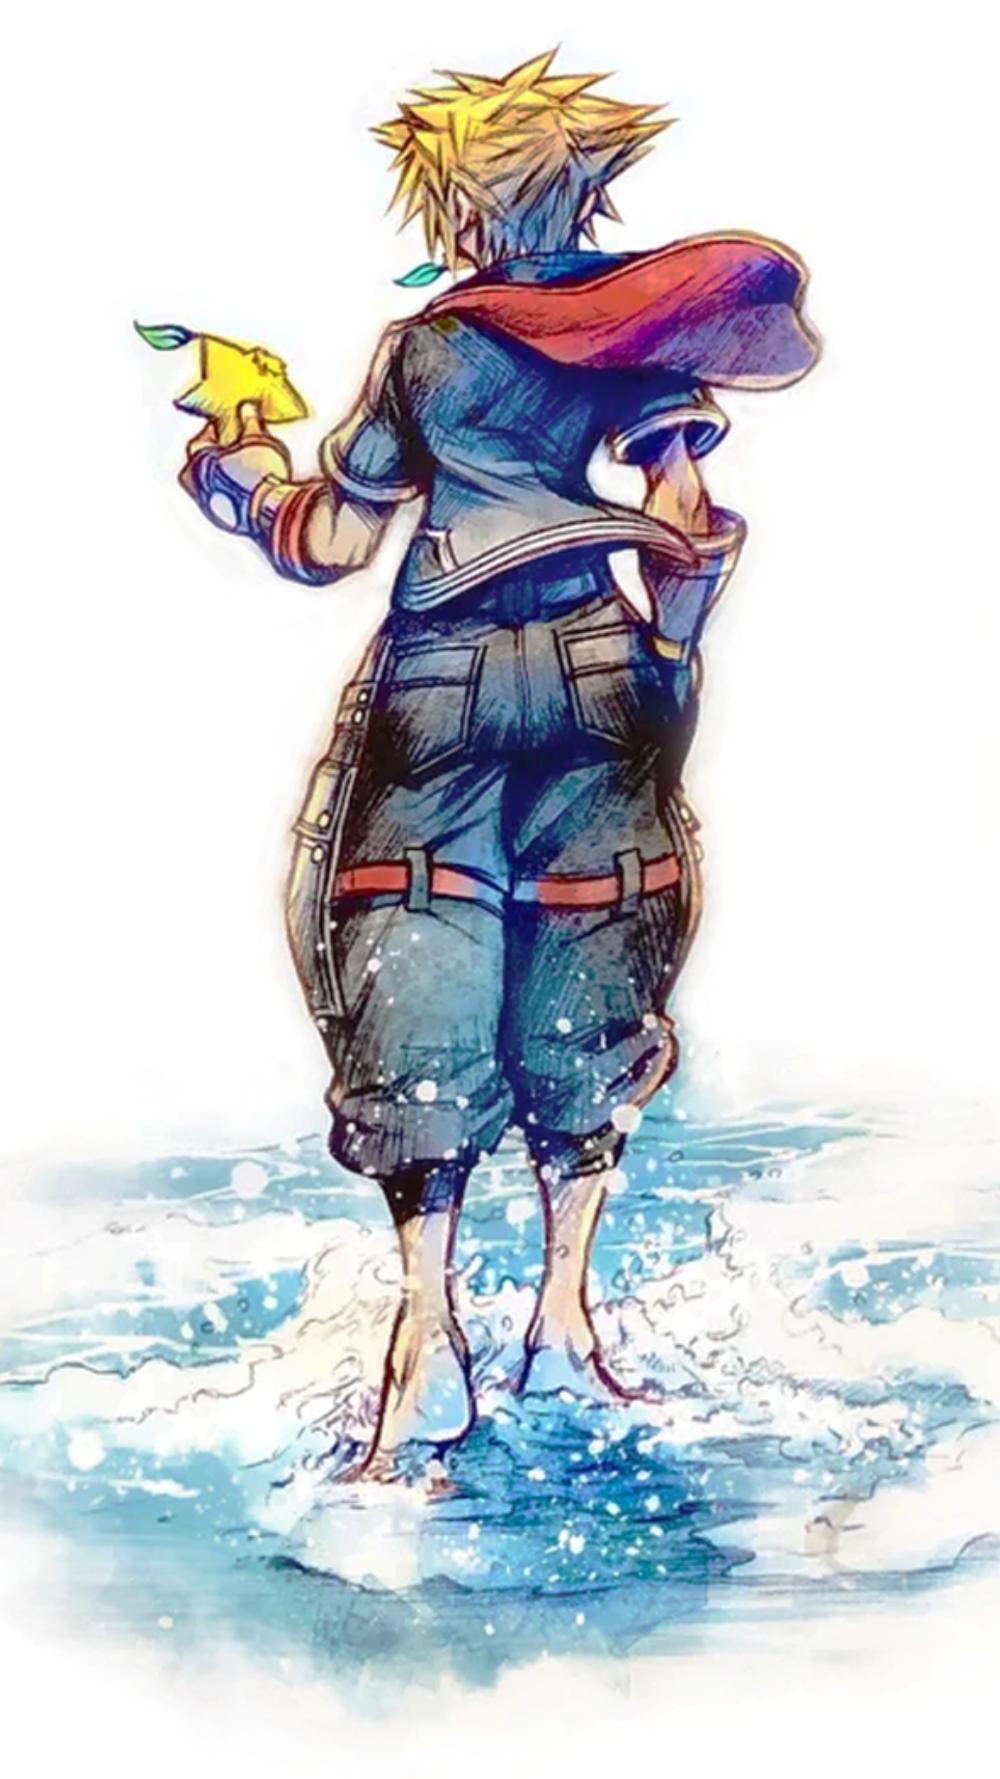 Kingdom Hearts 3 Cover Art Sora In 2020 Kingdom Hearts Wallpaper Kingdom Hearts Vanitas Kingdom Hearts